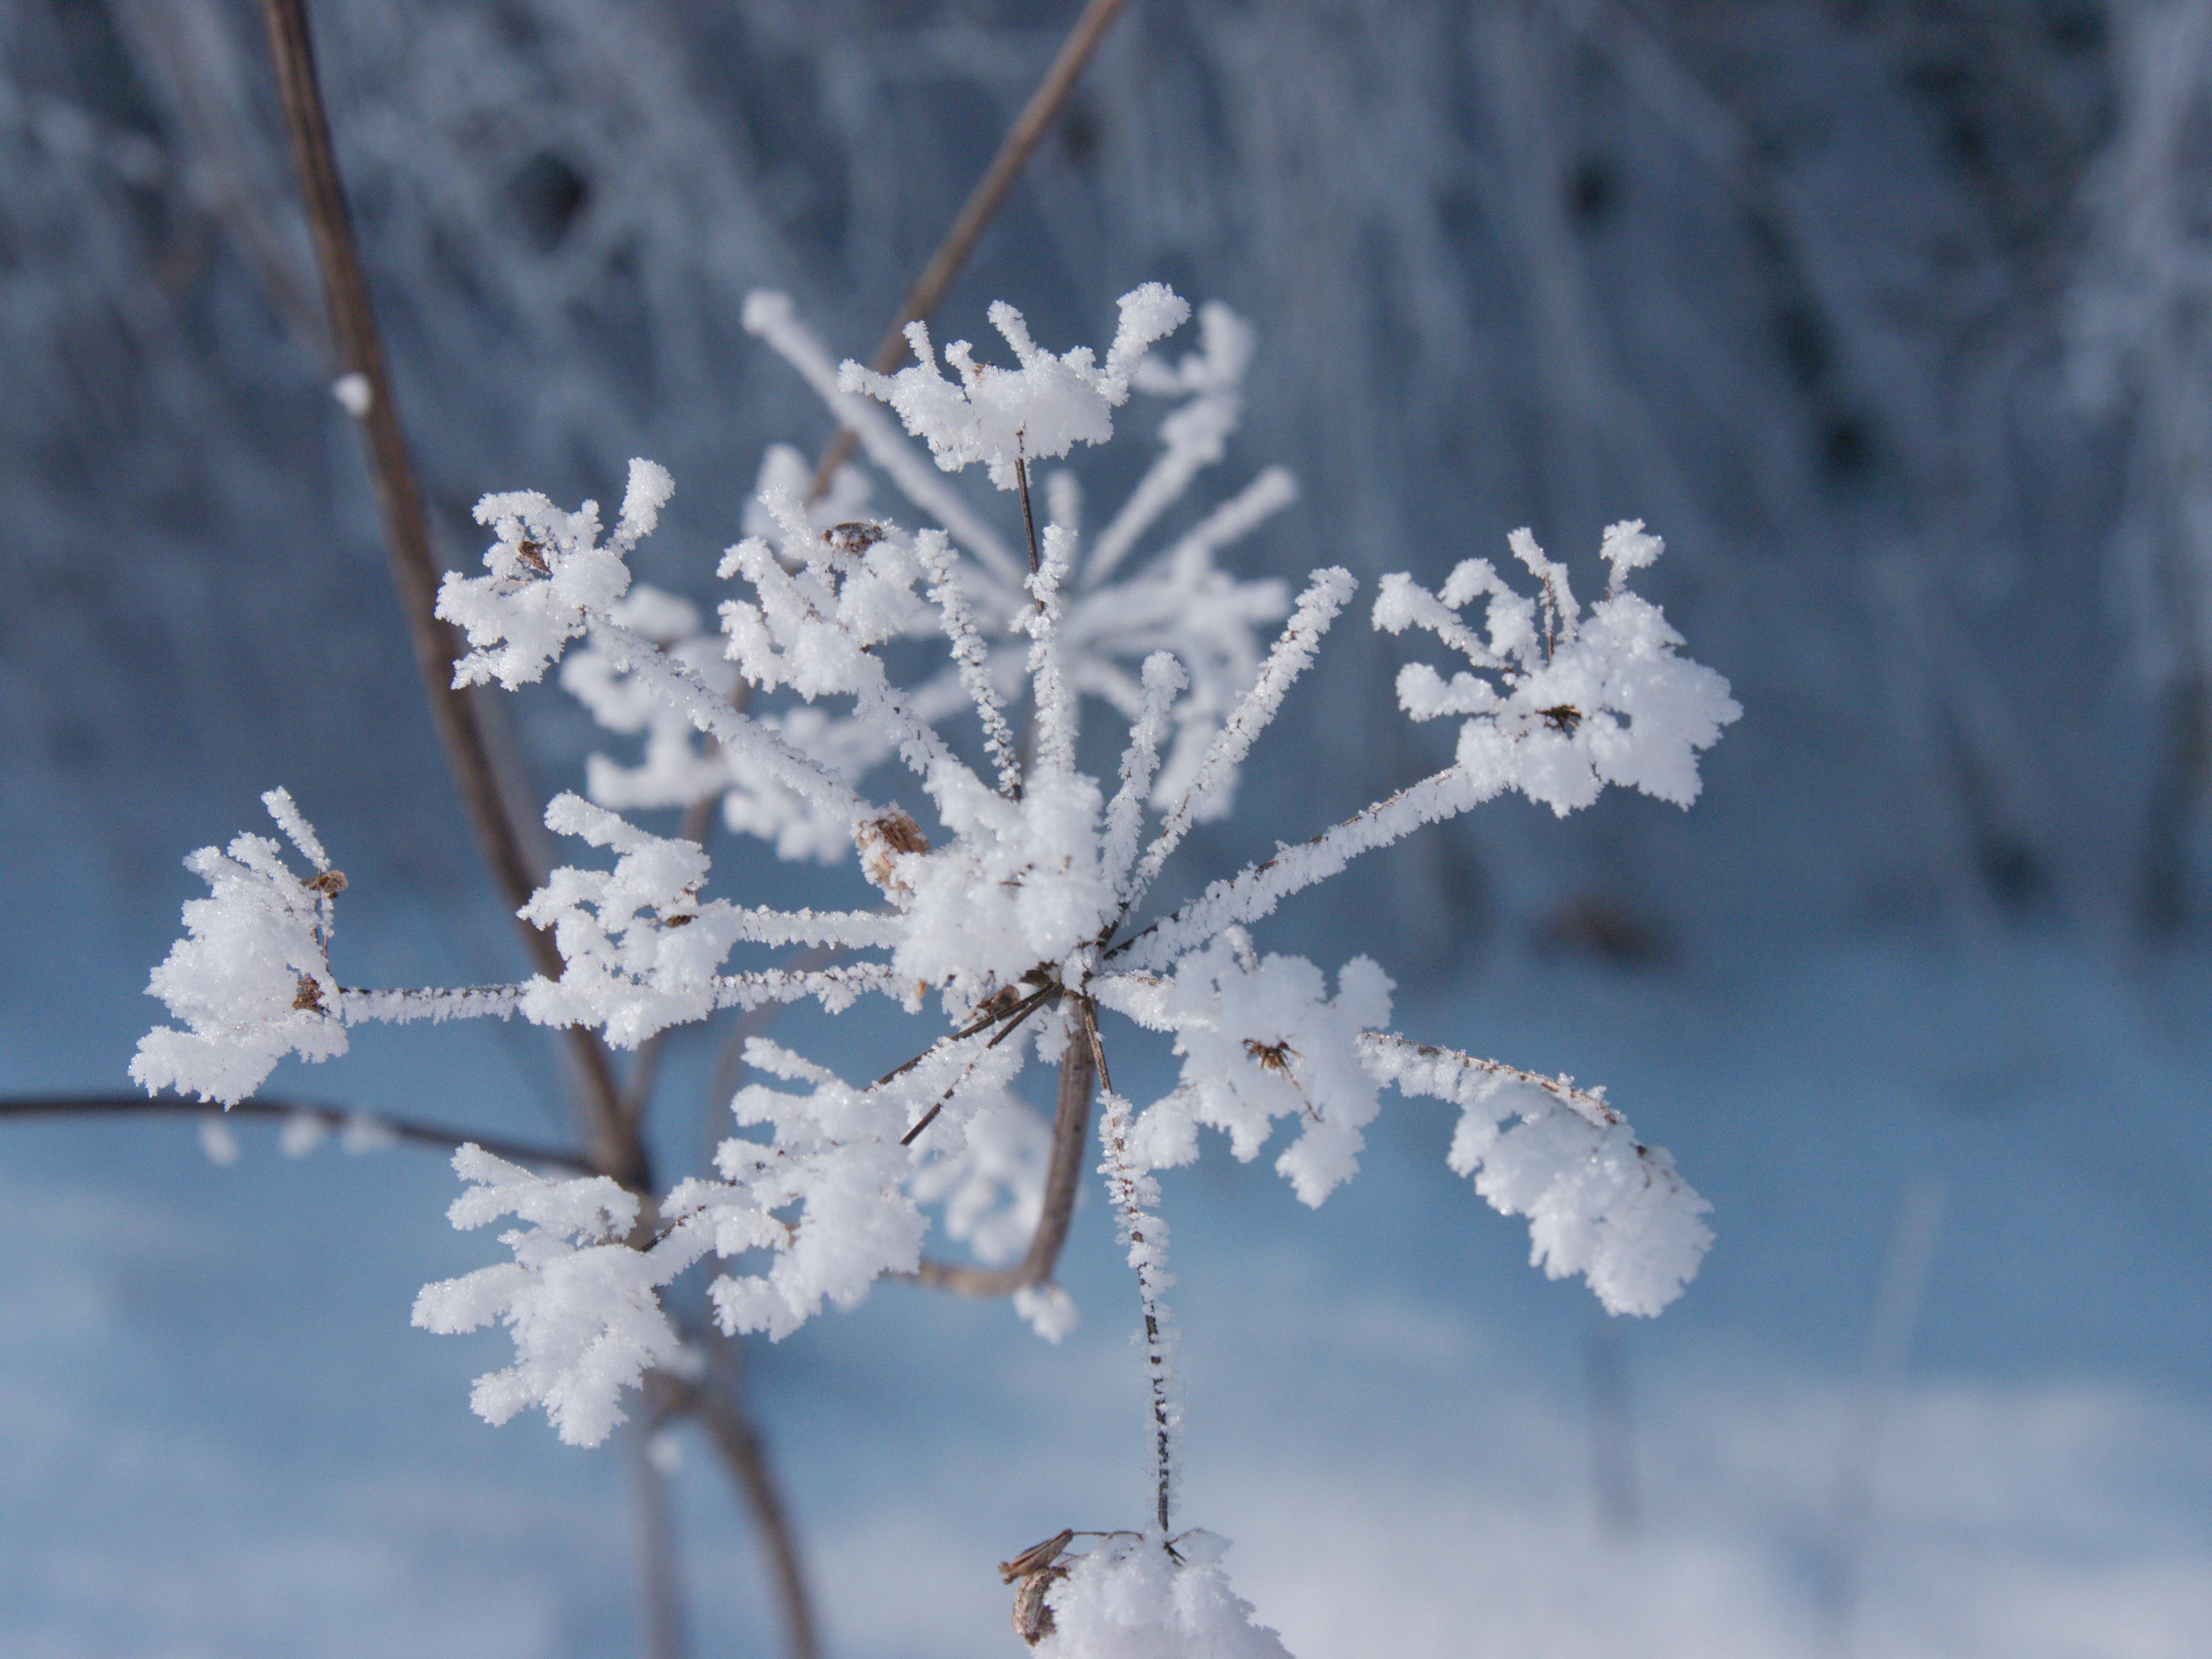 Free Images Sheep Gift Hemlock Plant Ice Flowers